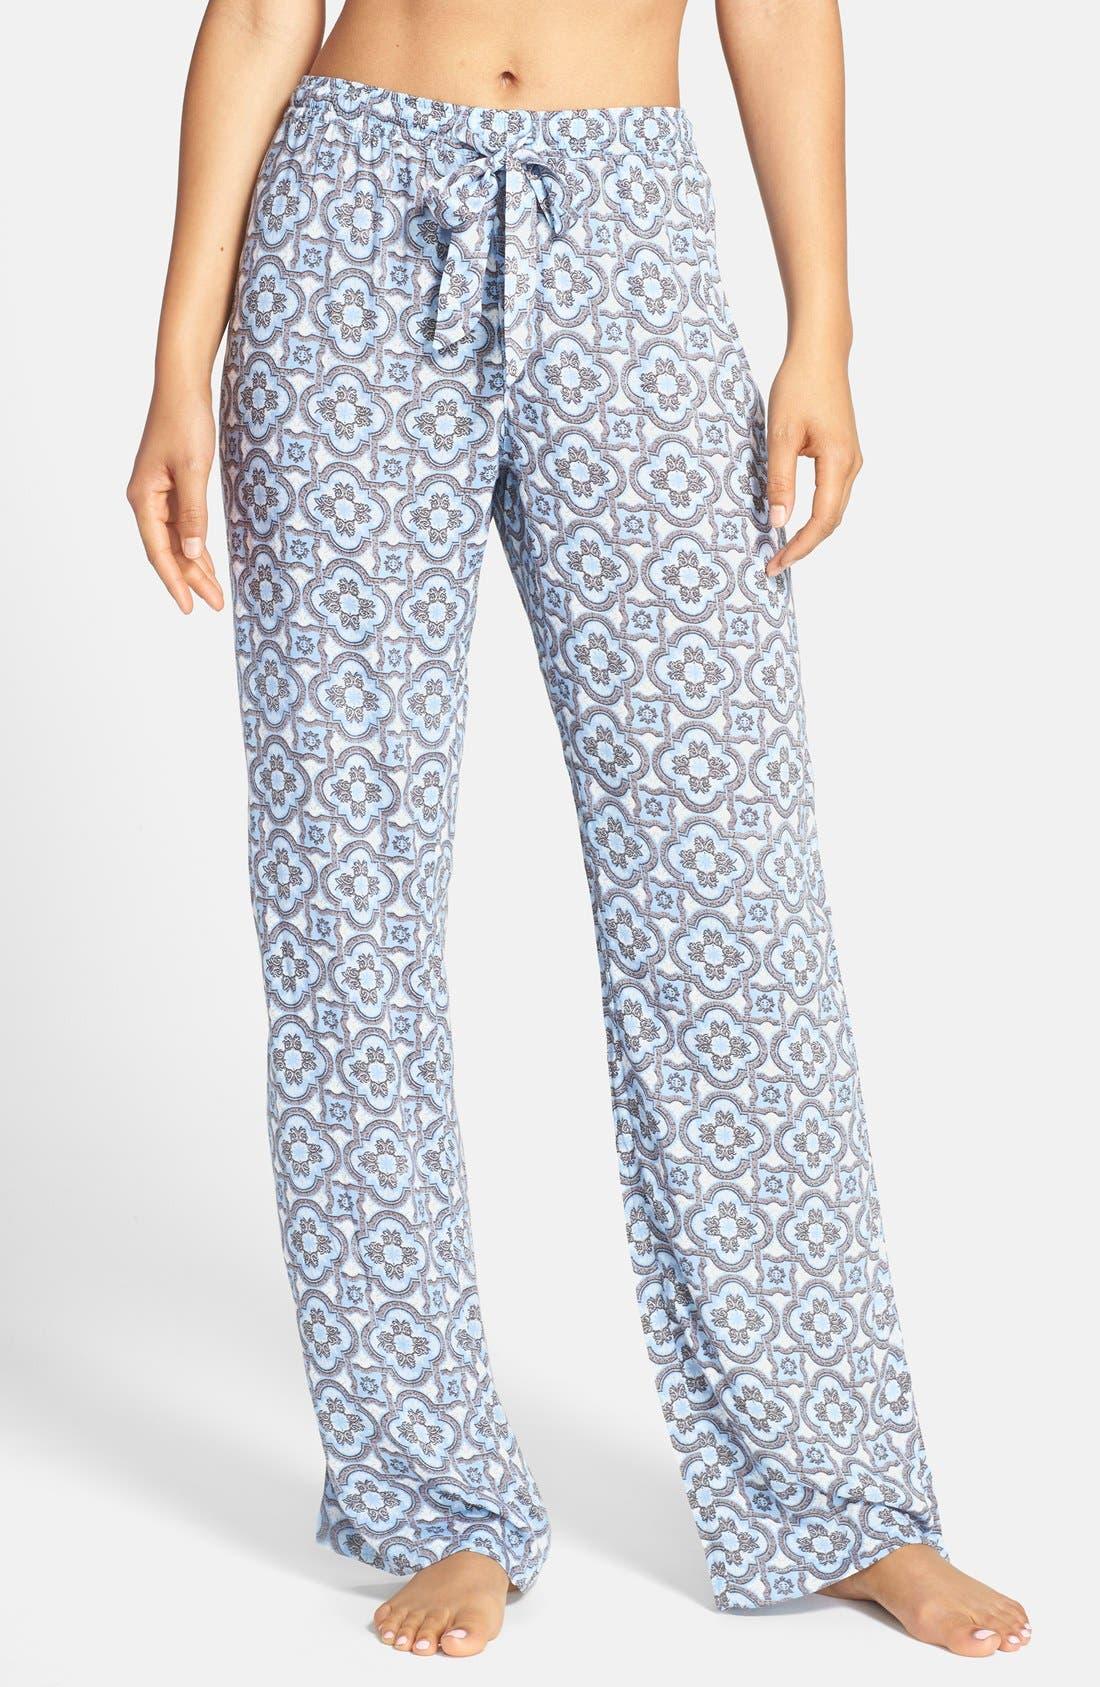 Alternate Image 1 Selected - PJ Salvage 'Challe' Pajama Pants